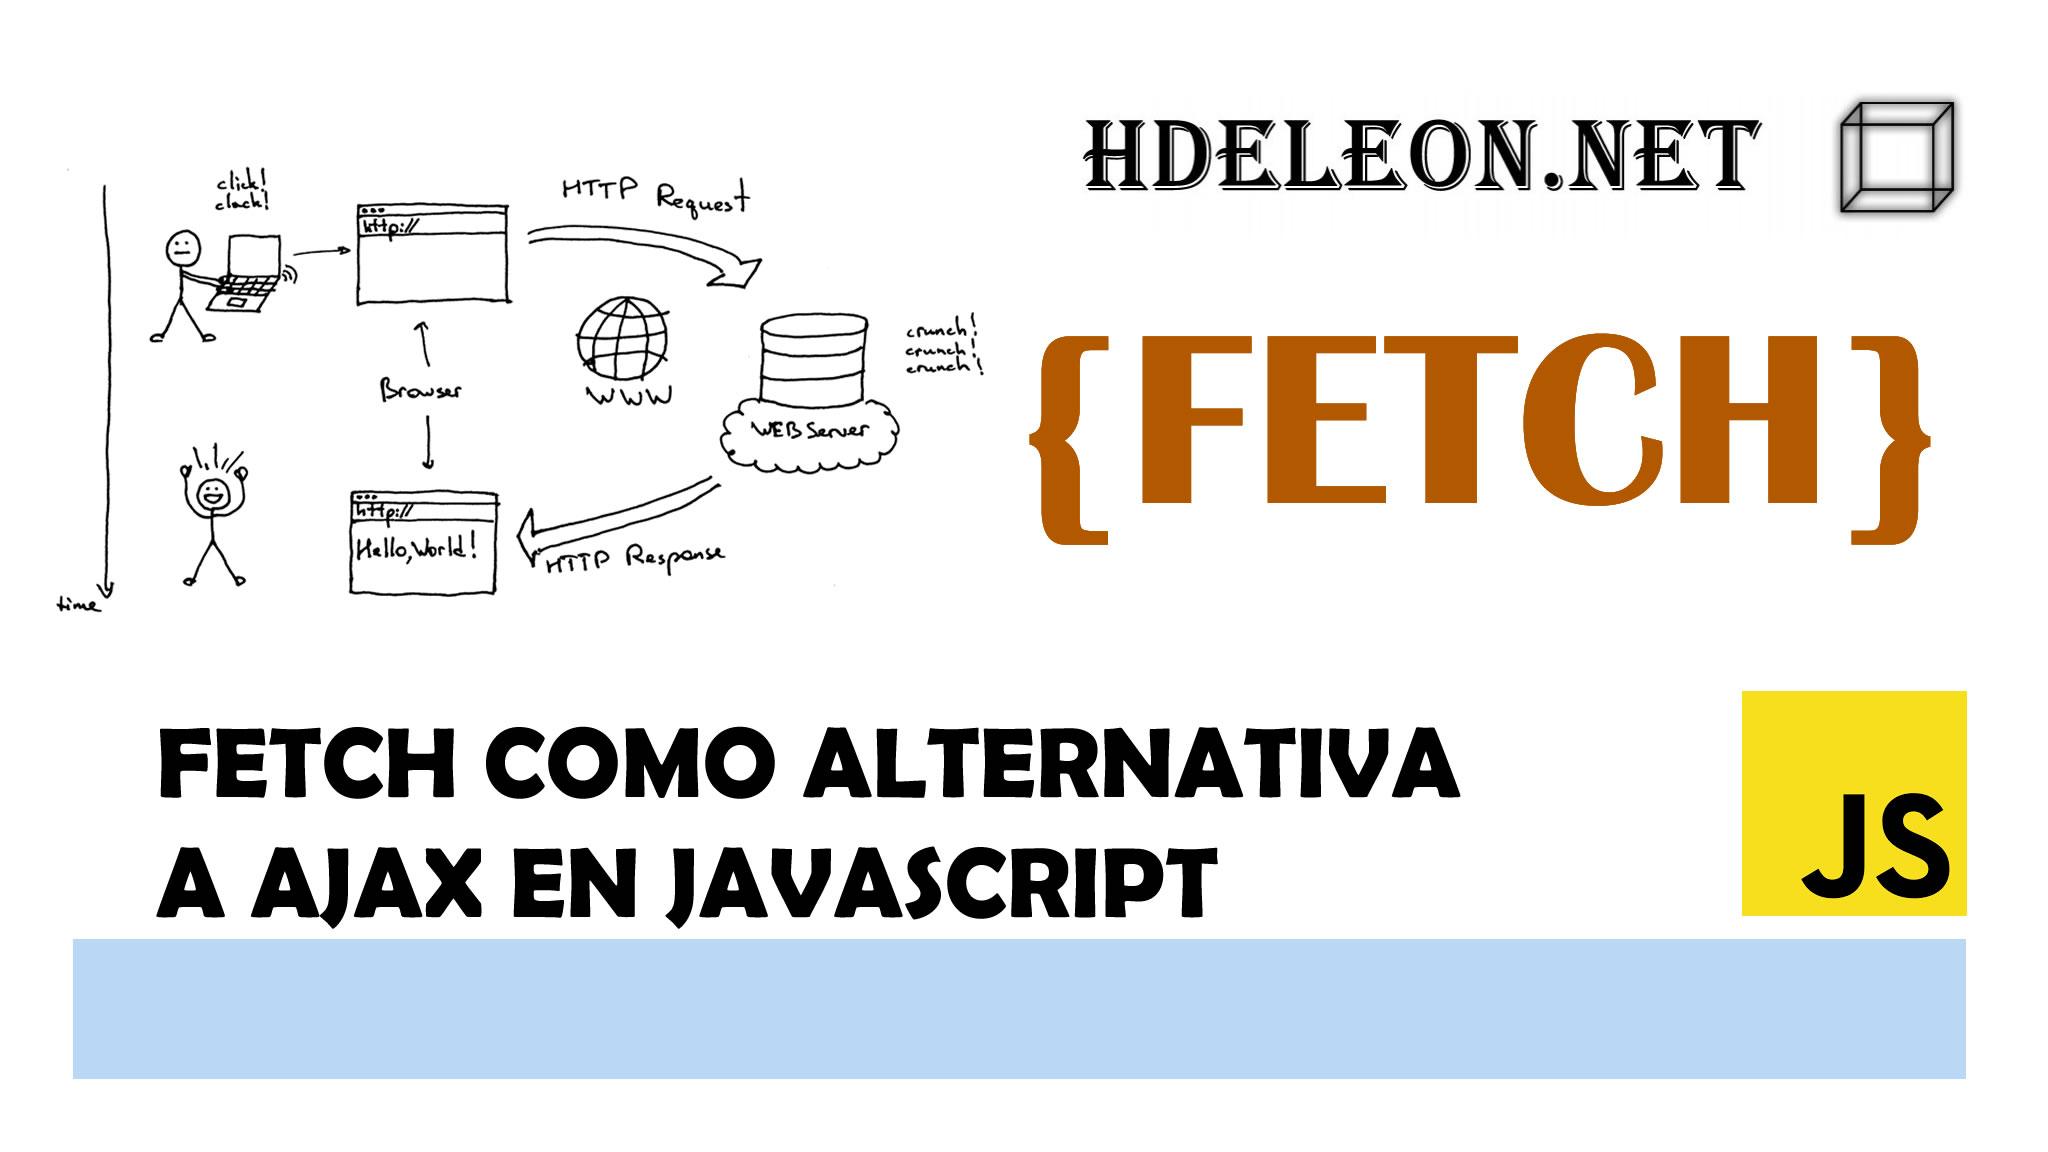 Fetch como alternativa a AJAX en javascript, API Fetch